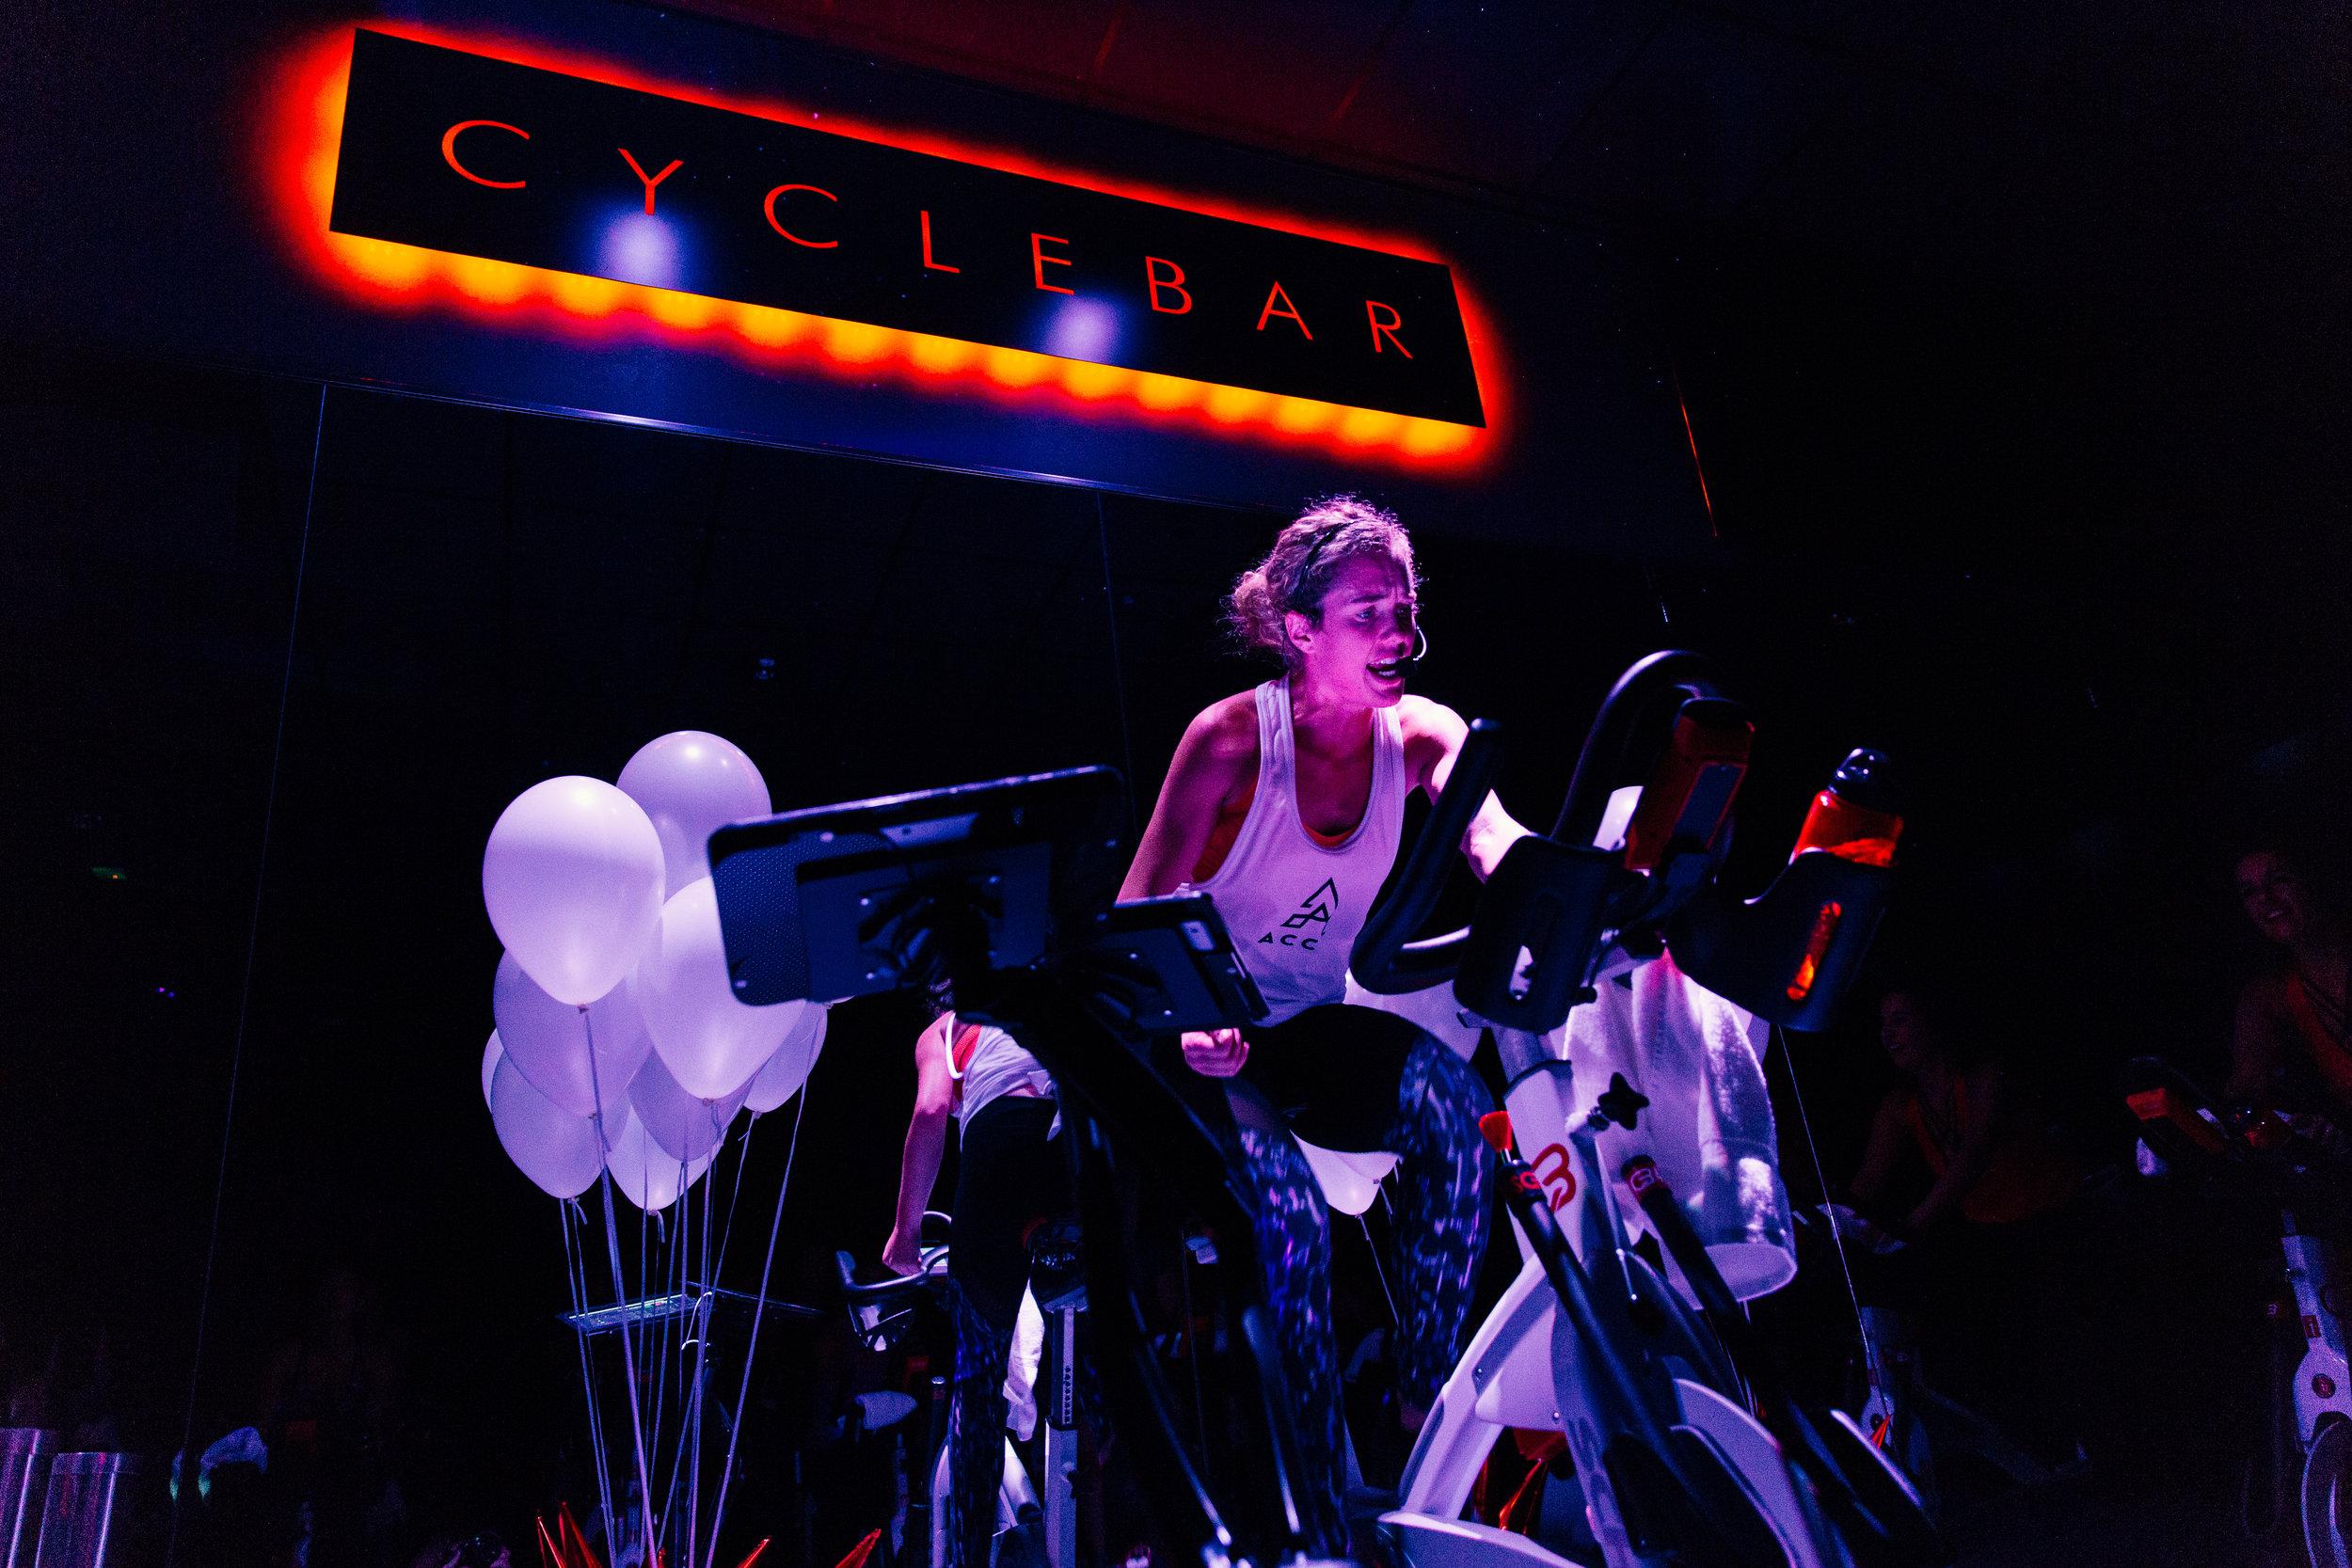 Kirby-Gladstein-CycleBar-Sawyer-Heights-Influencer-Night-2017-2070.jpg